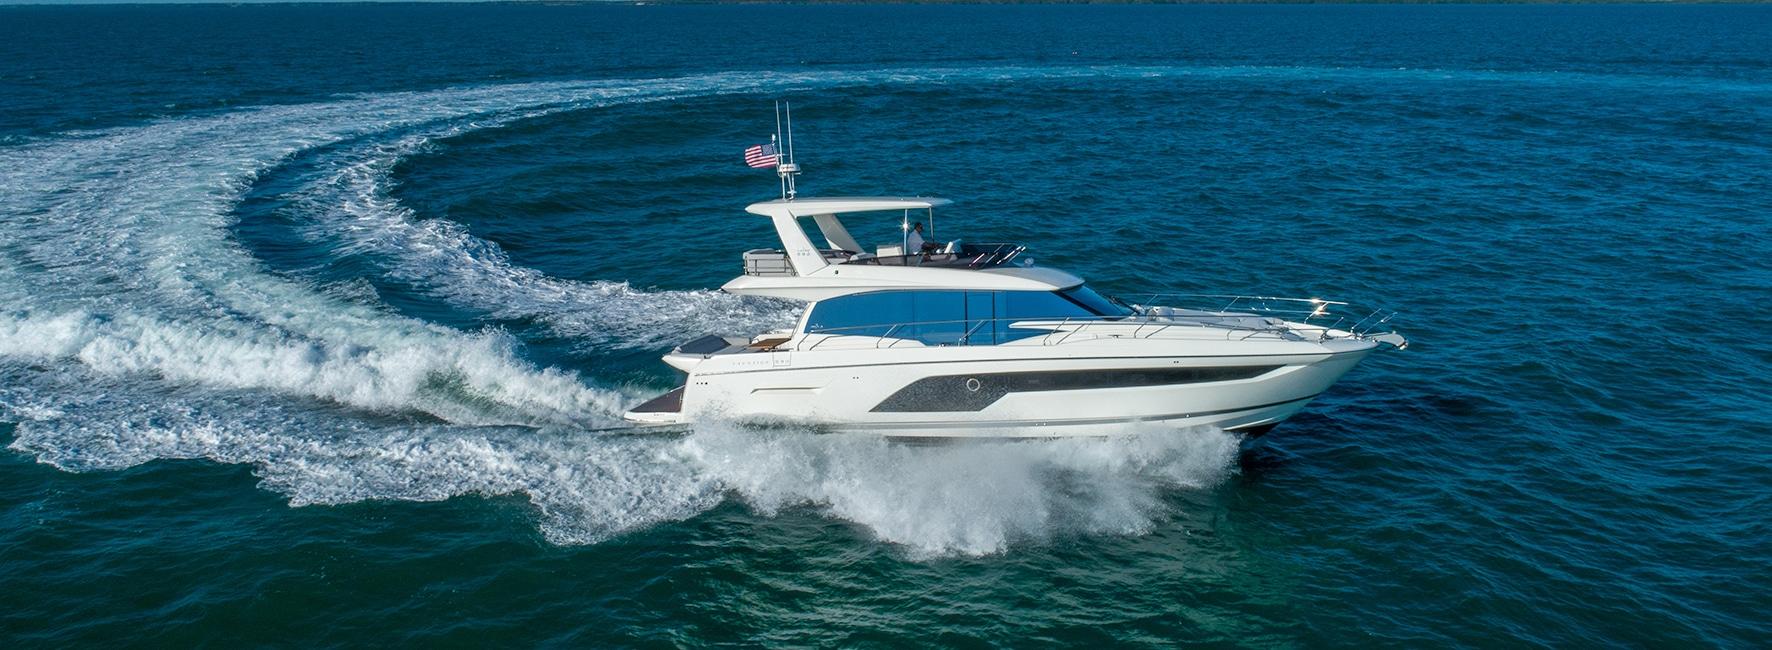 New Prestige Yacht from Galati Yacht Sales